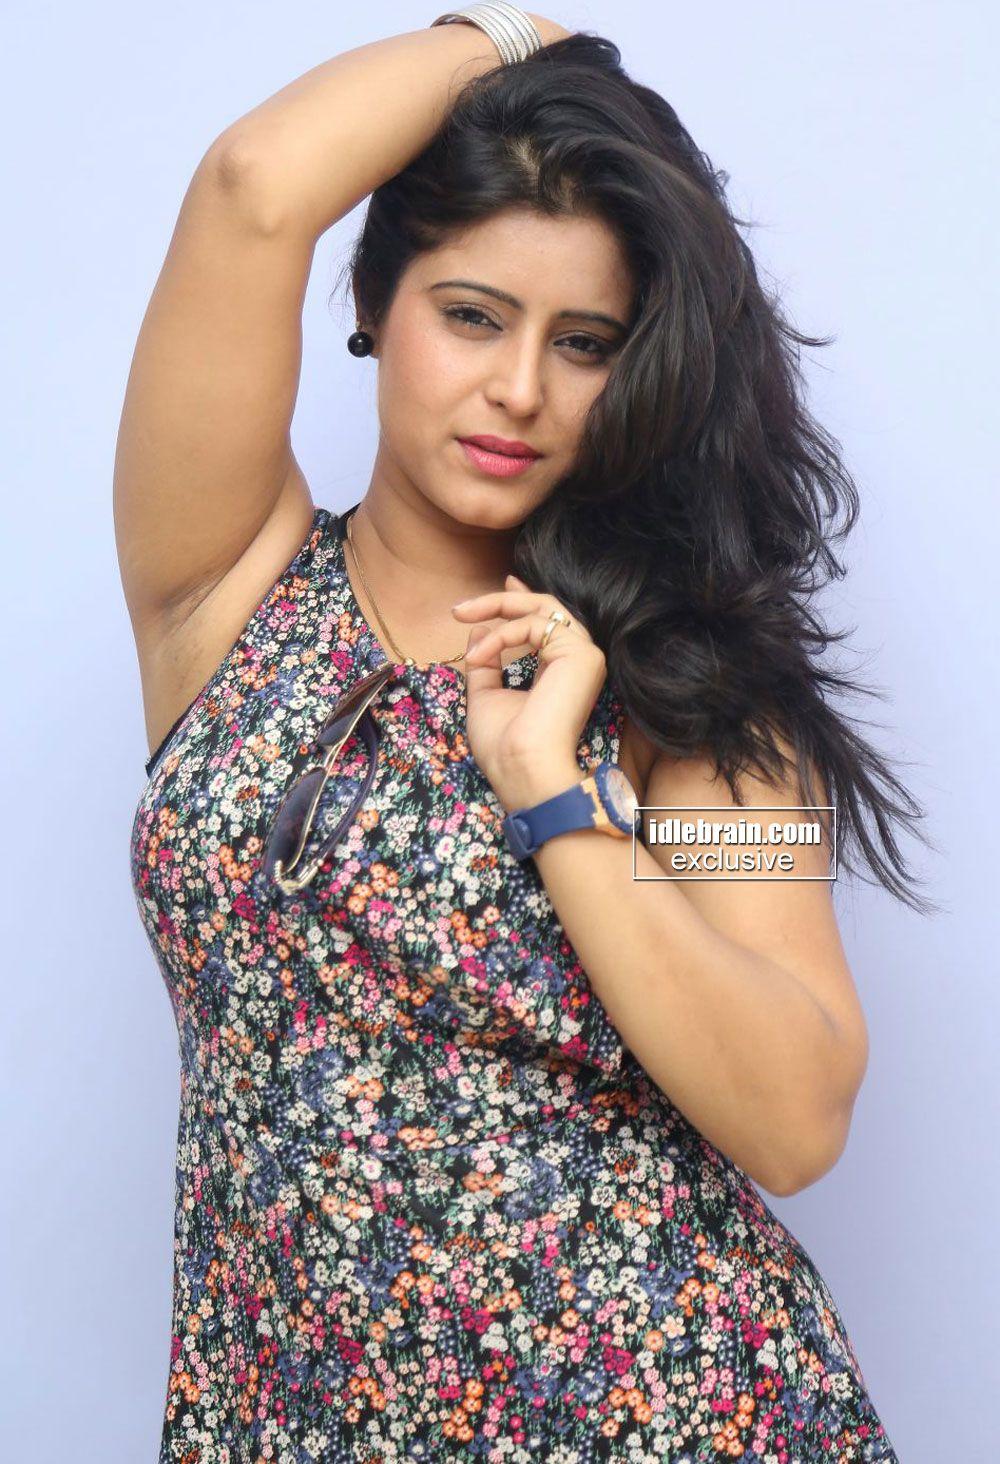 Manisha Tagore Actress Hot Armpit Desi Armpit Mallu Armpit Masala Armpit Shaved Armpit Dark Armpit Hairy Armpit